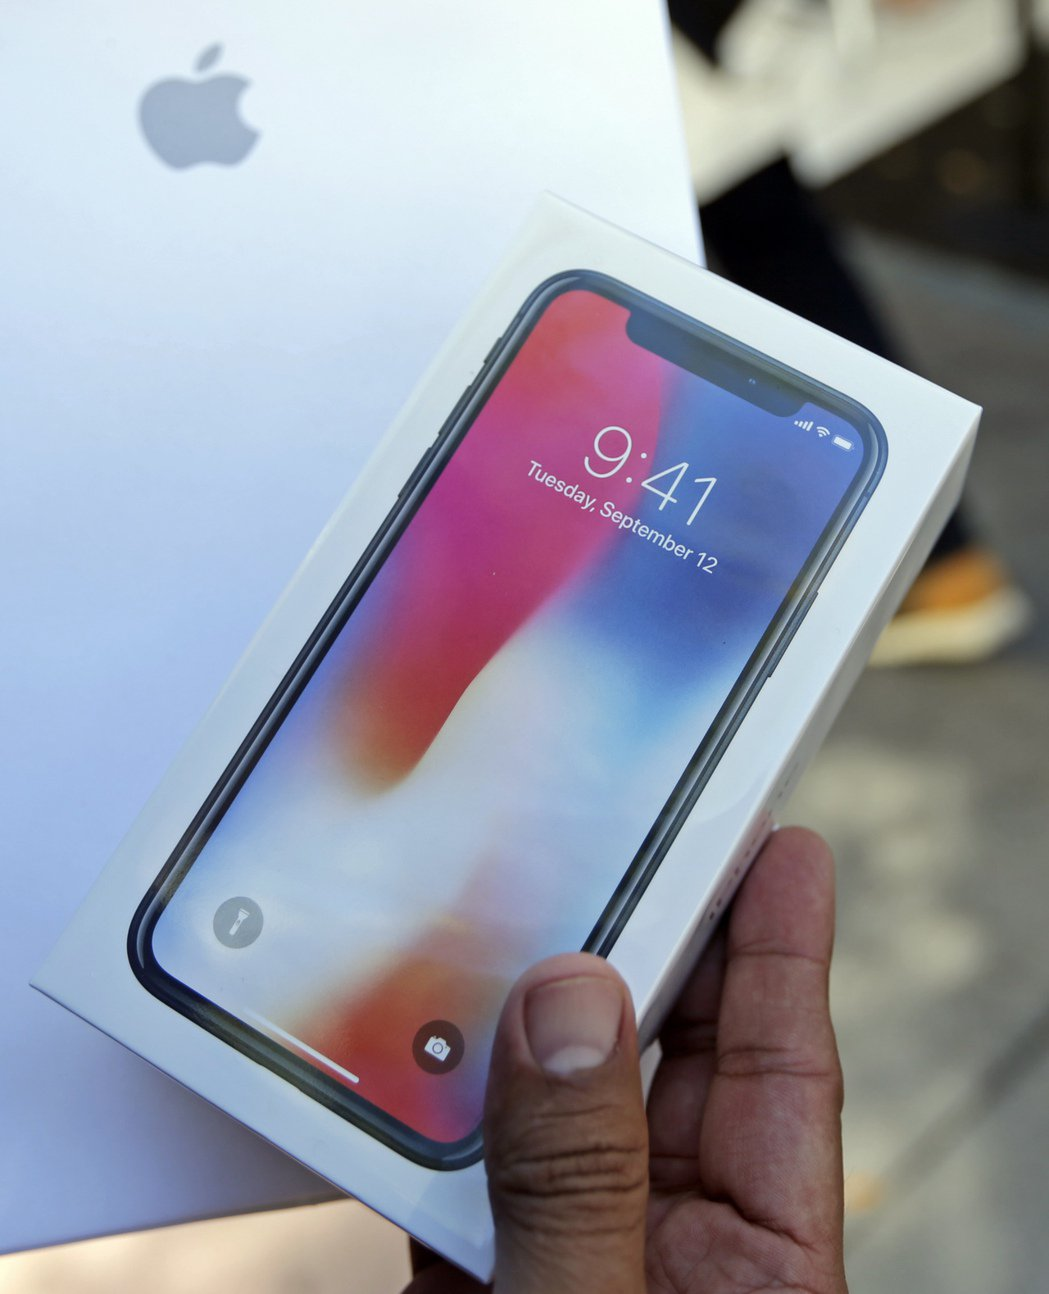 iPhone X共有201家供應商,其中52家位在台灣。